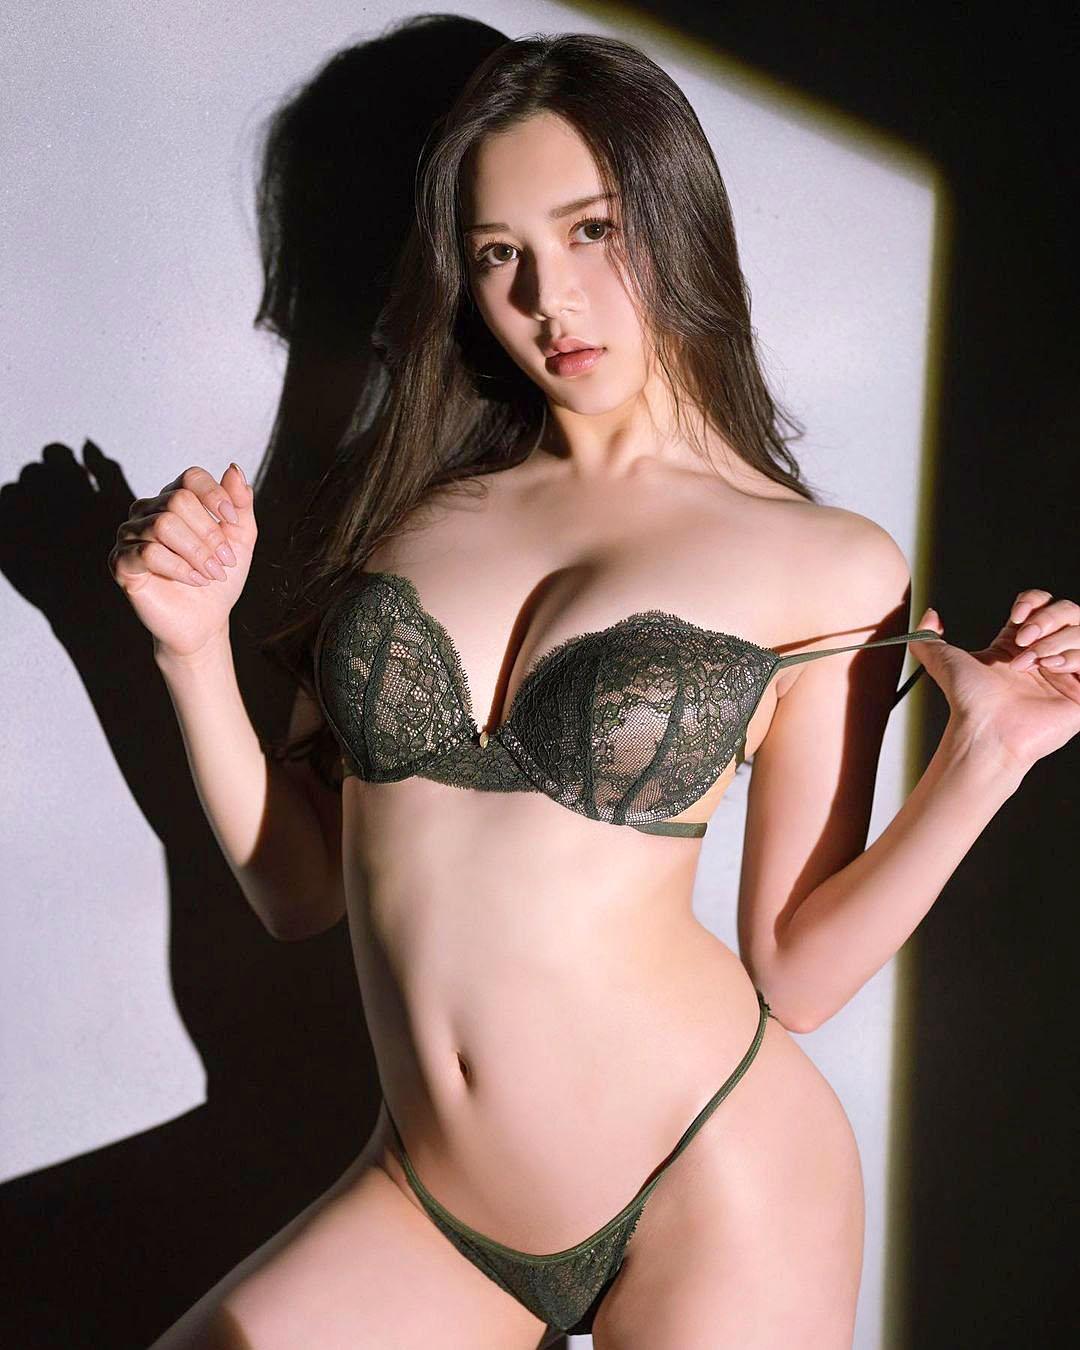 Miu Shiramine 2103 22.jpg